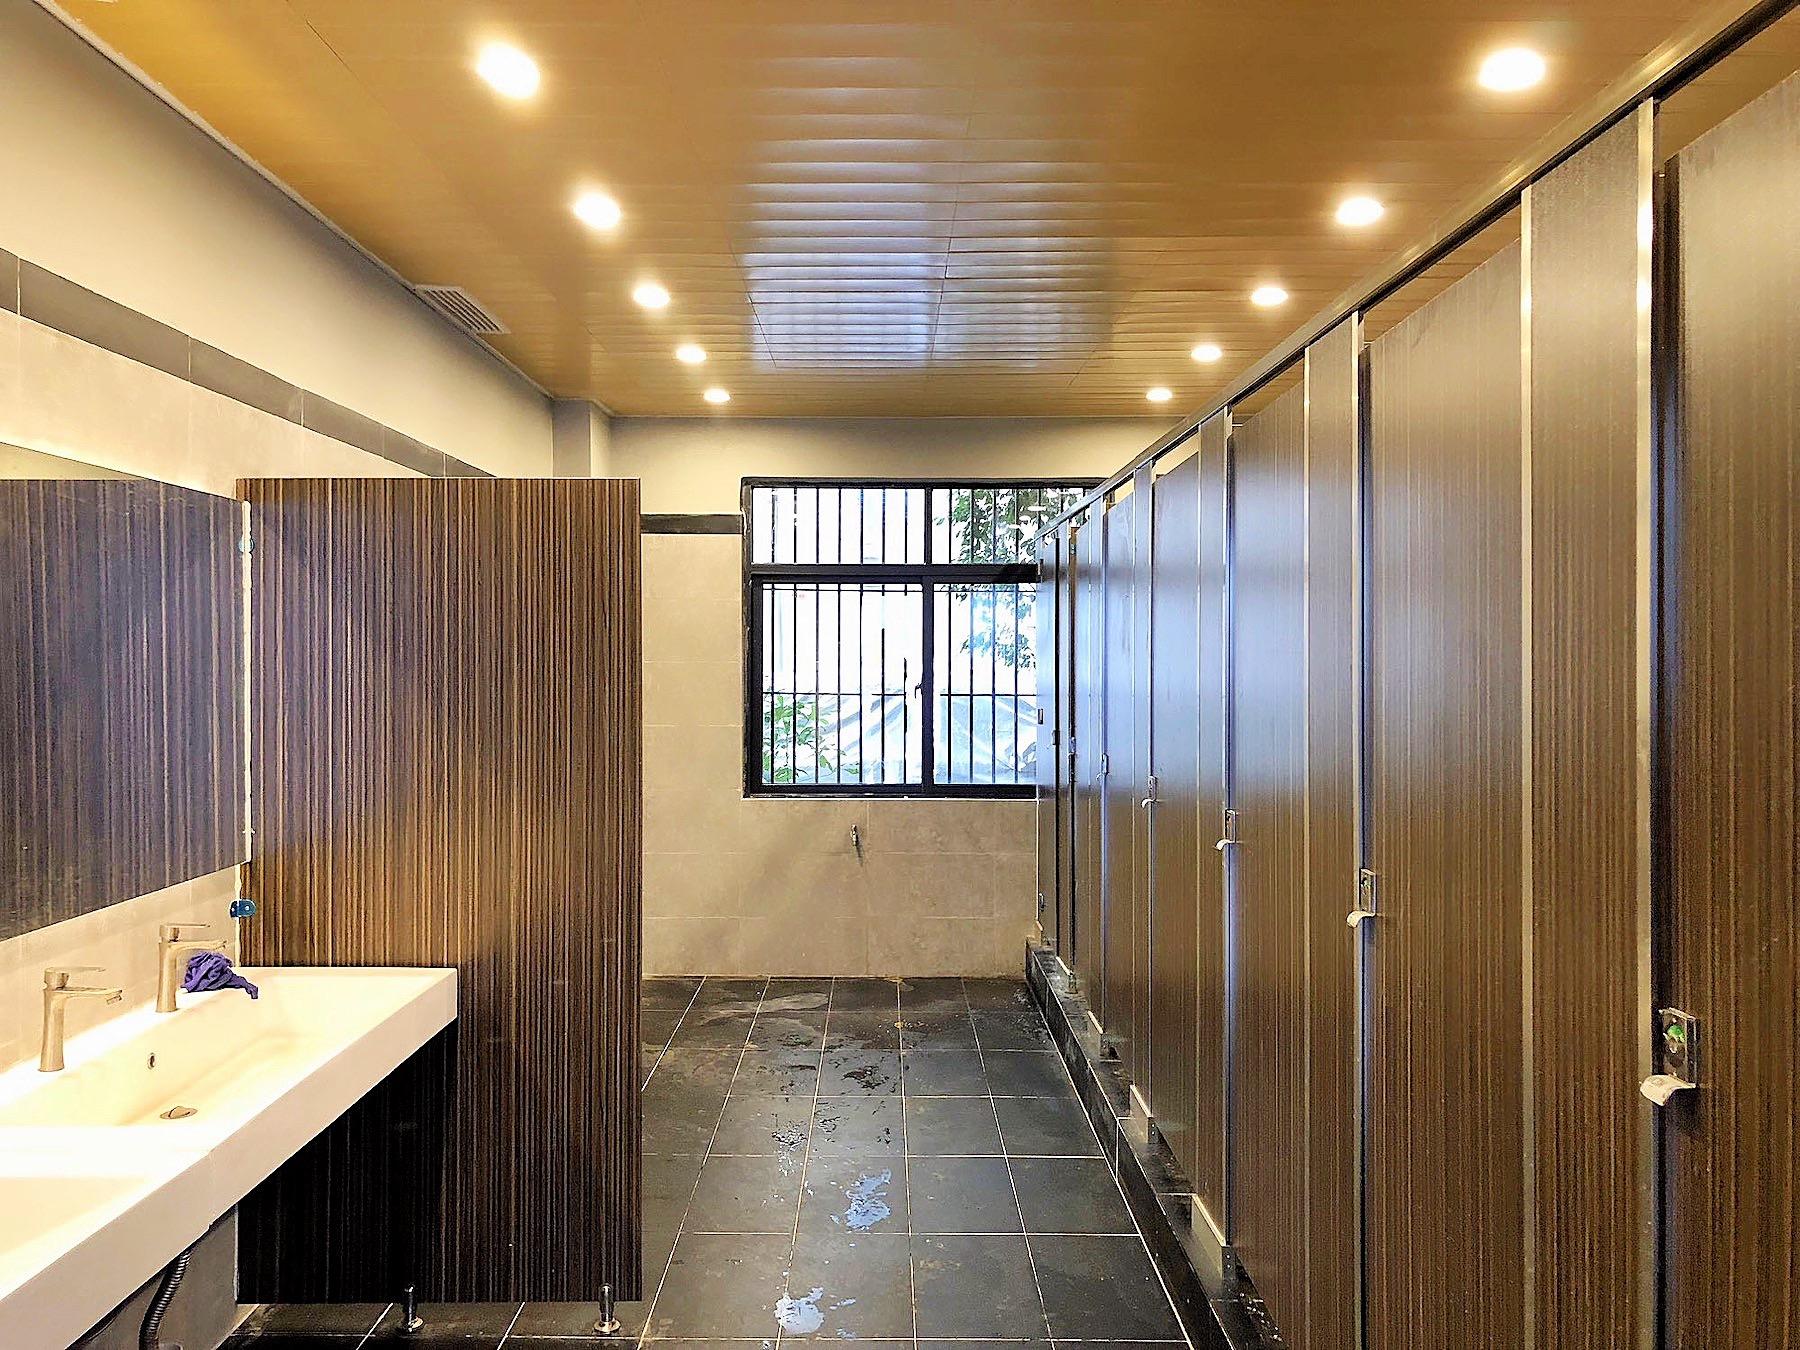 Grandway Office Renovation 2018 Sfaff Toliet 005